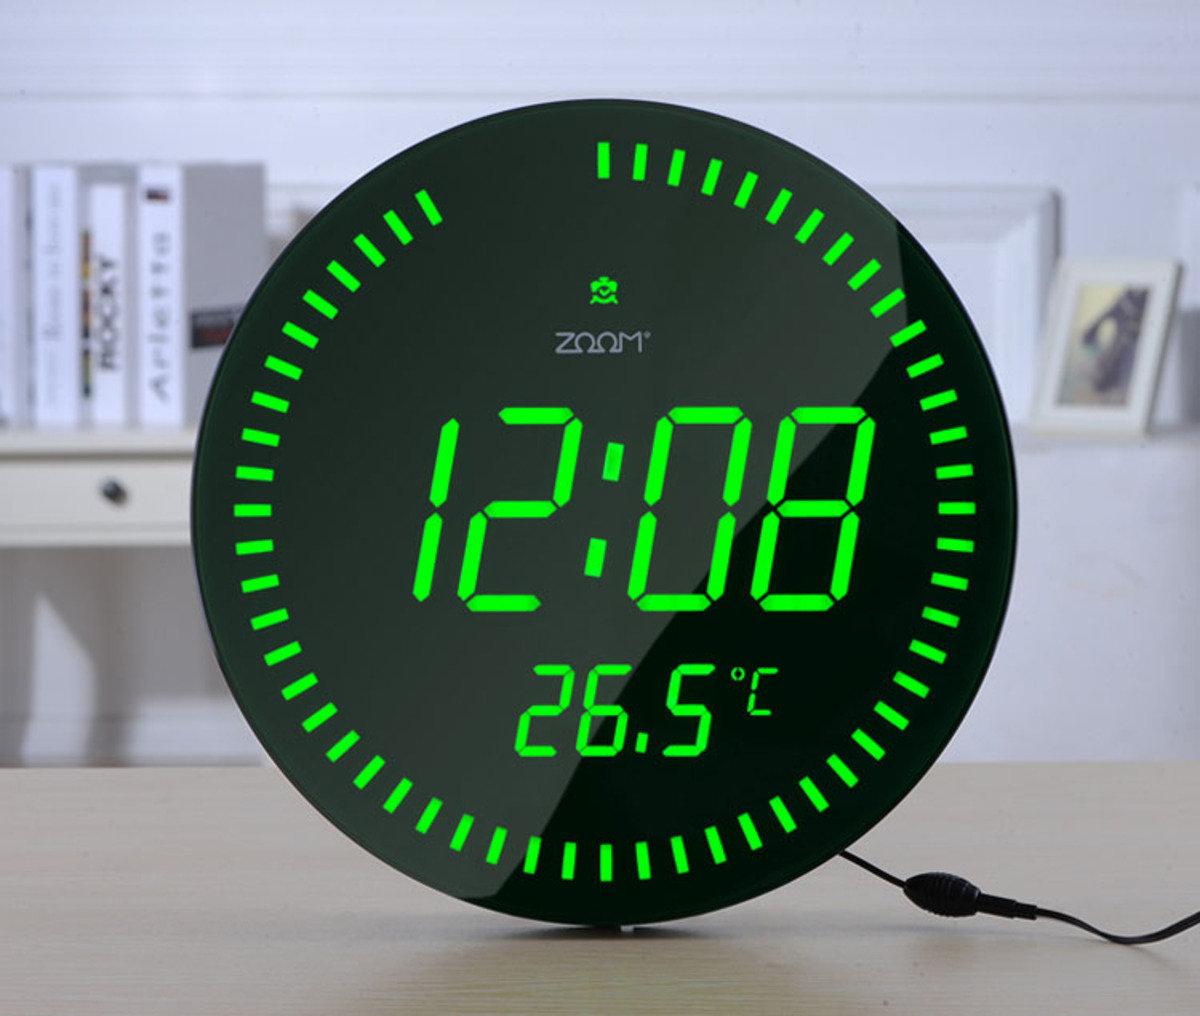 LED 掛牆遙控鬧鐘連溫度 時尚 創意 生活 品味 禮品 電子 長者 學生 兒童 靜音 家居 床頭 夜光 貪睡 時鐘